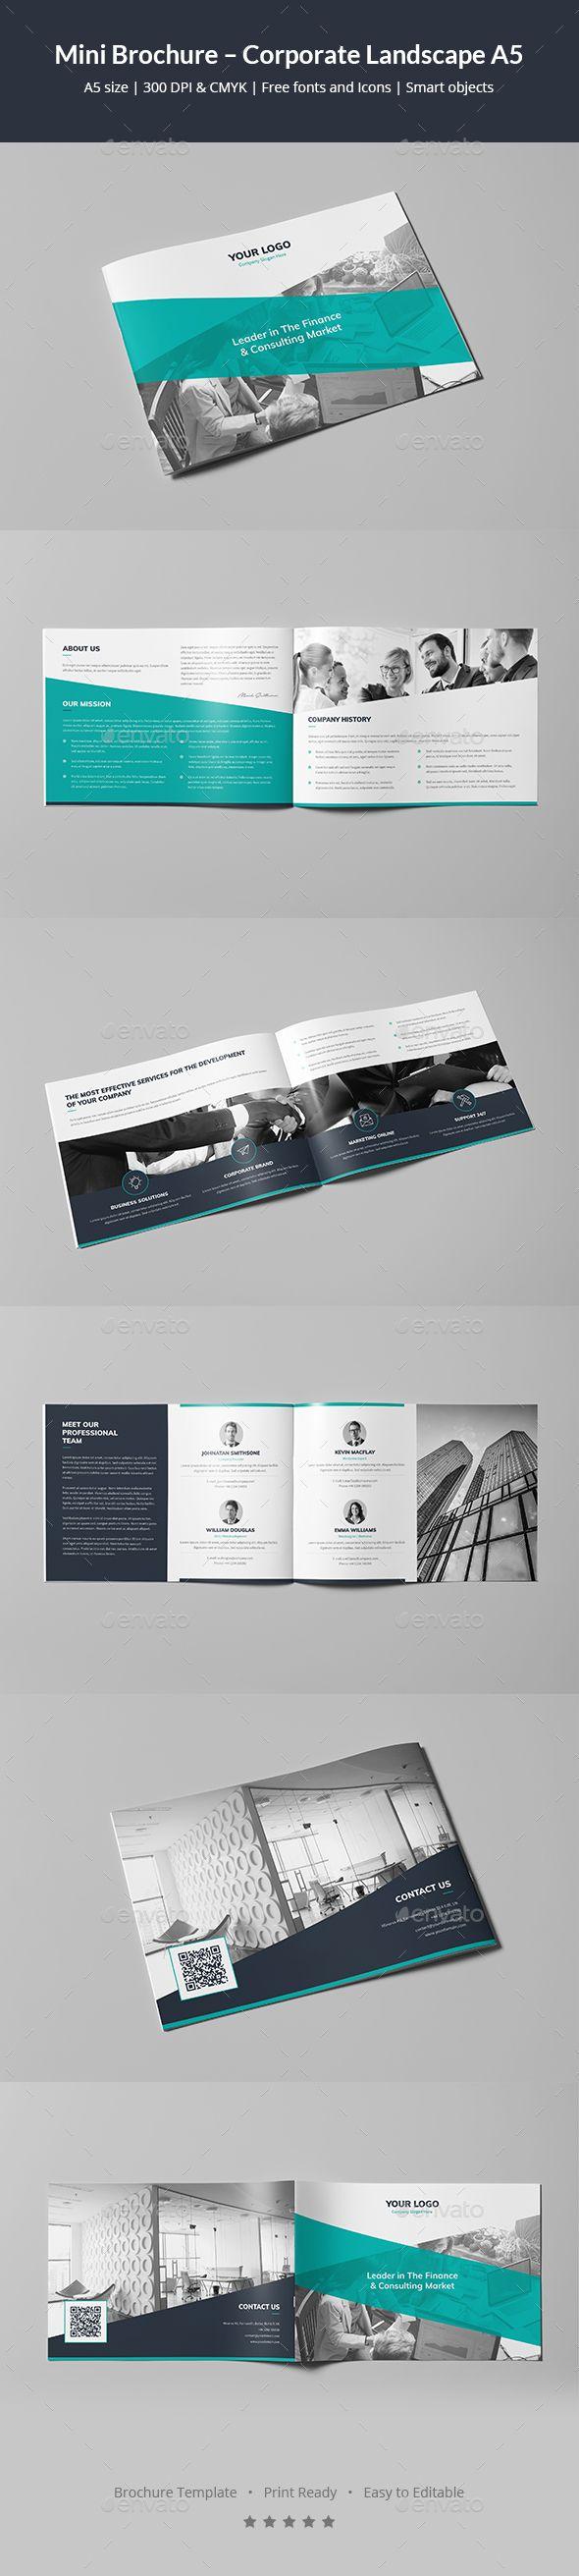 Mini Brochure Corporate Landscape A5 Brochures Brochure